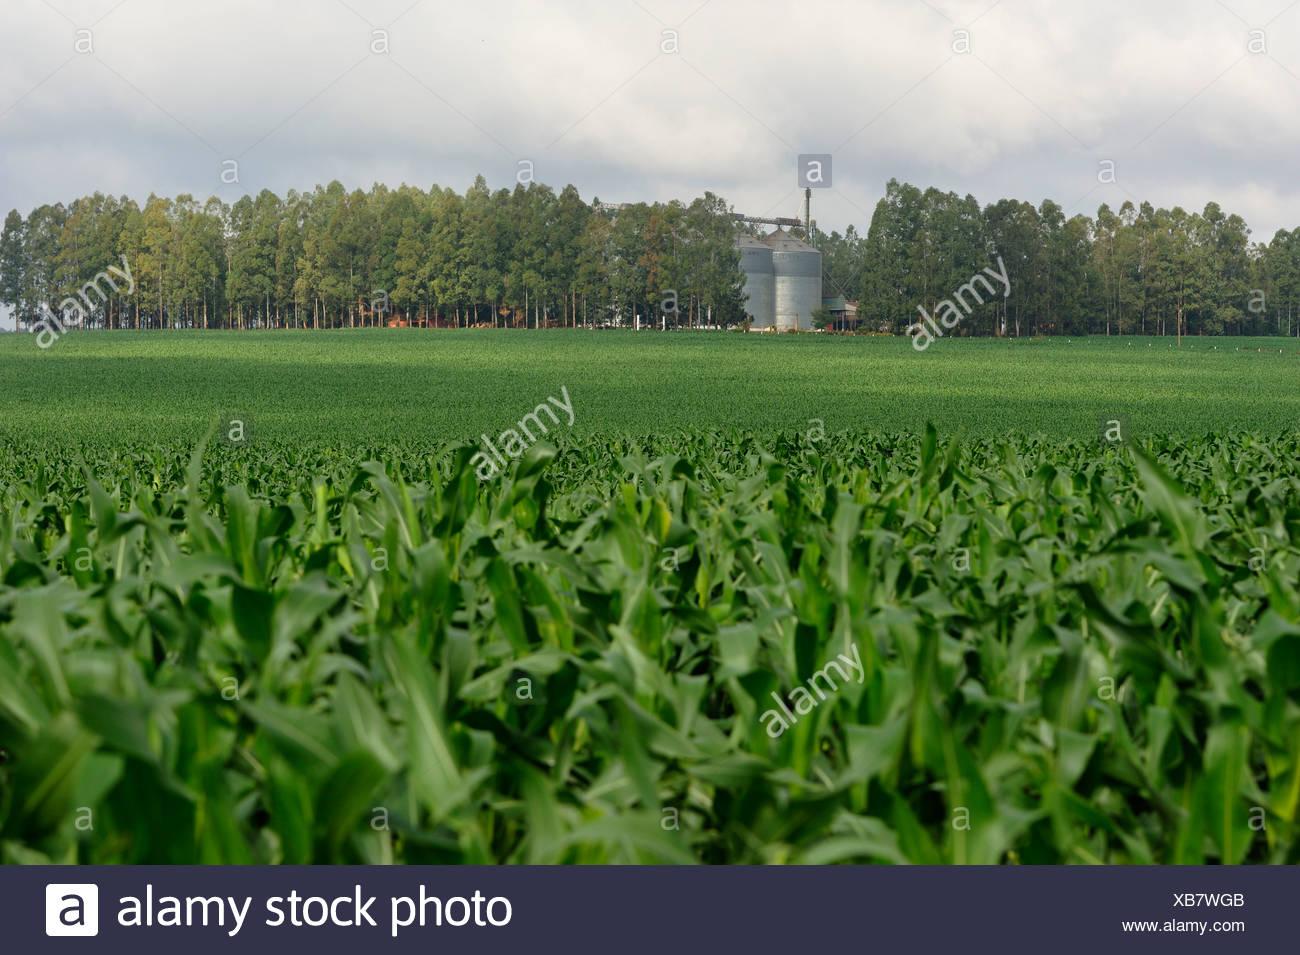 Cornfield, genetically modified corn and a silo, Alto Parana, Paraguay, South America - Stock Image